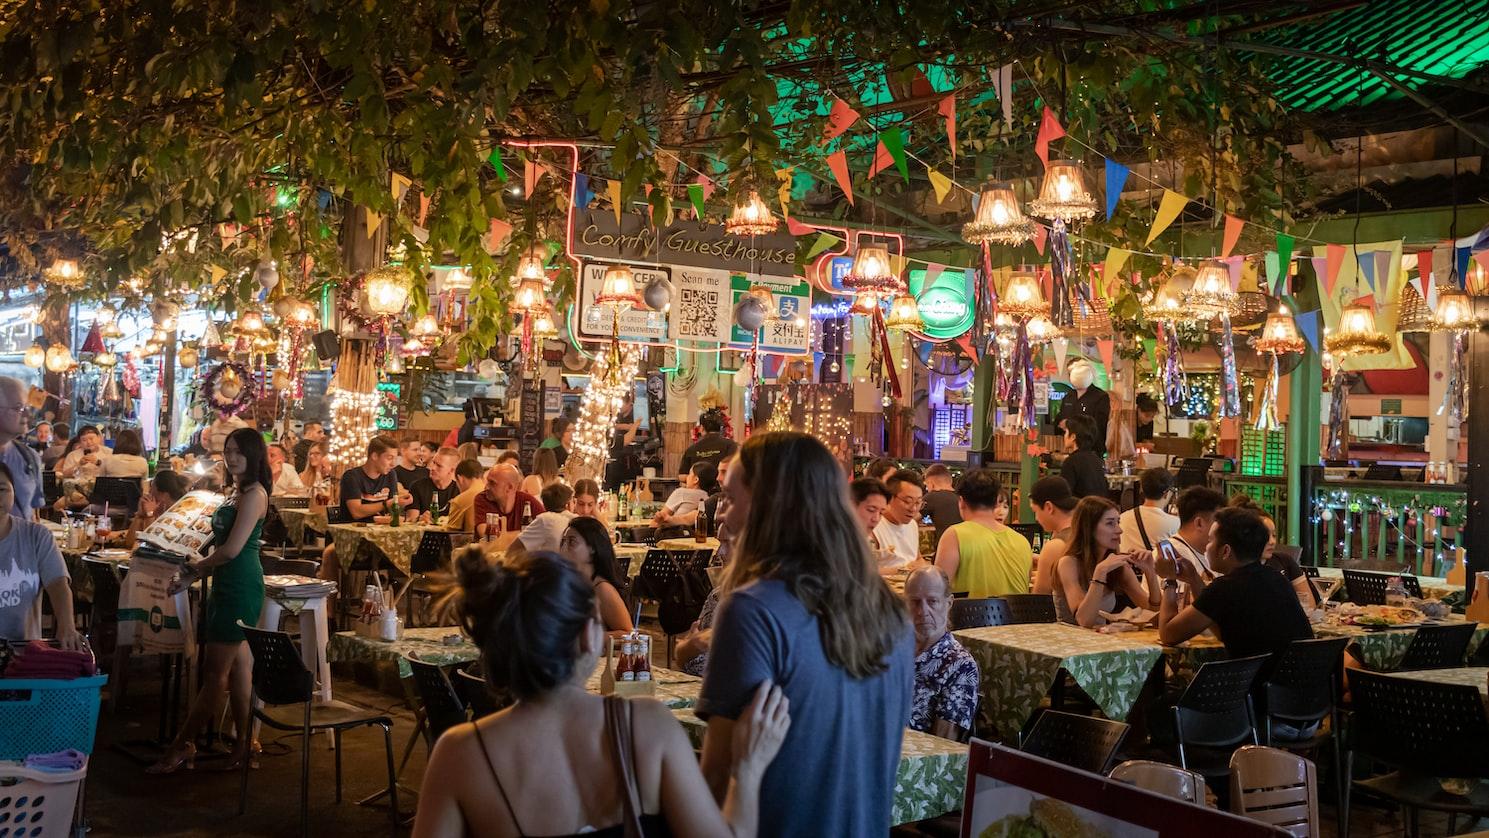 People in an open restaurant